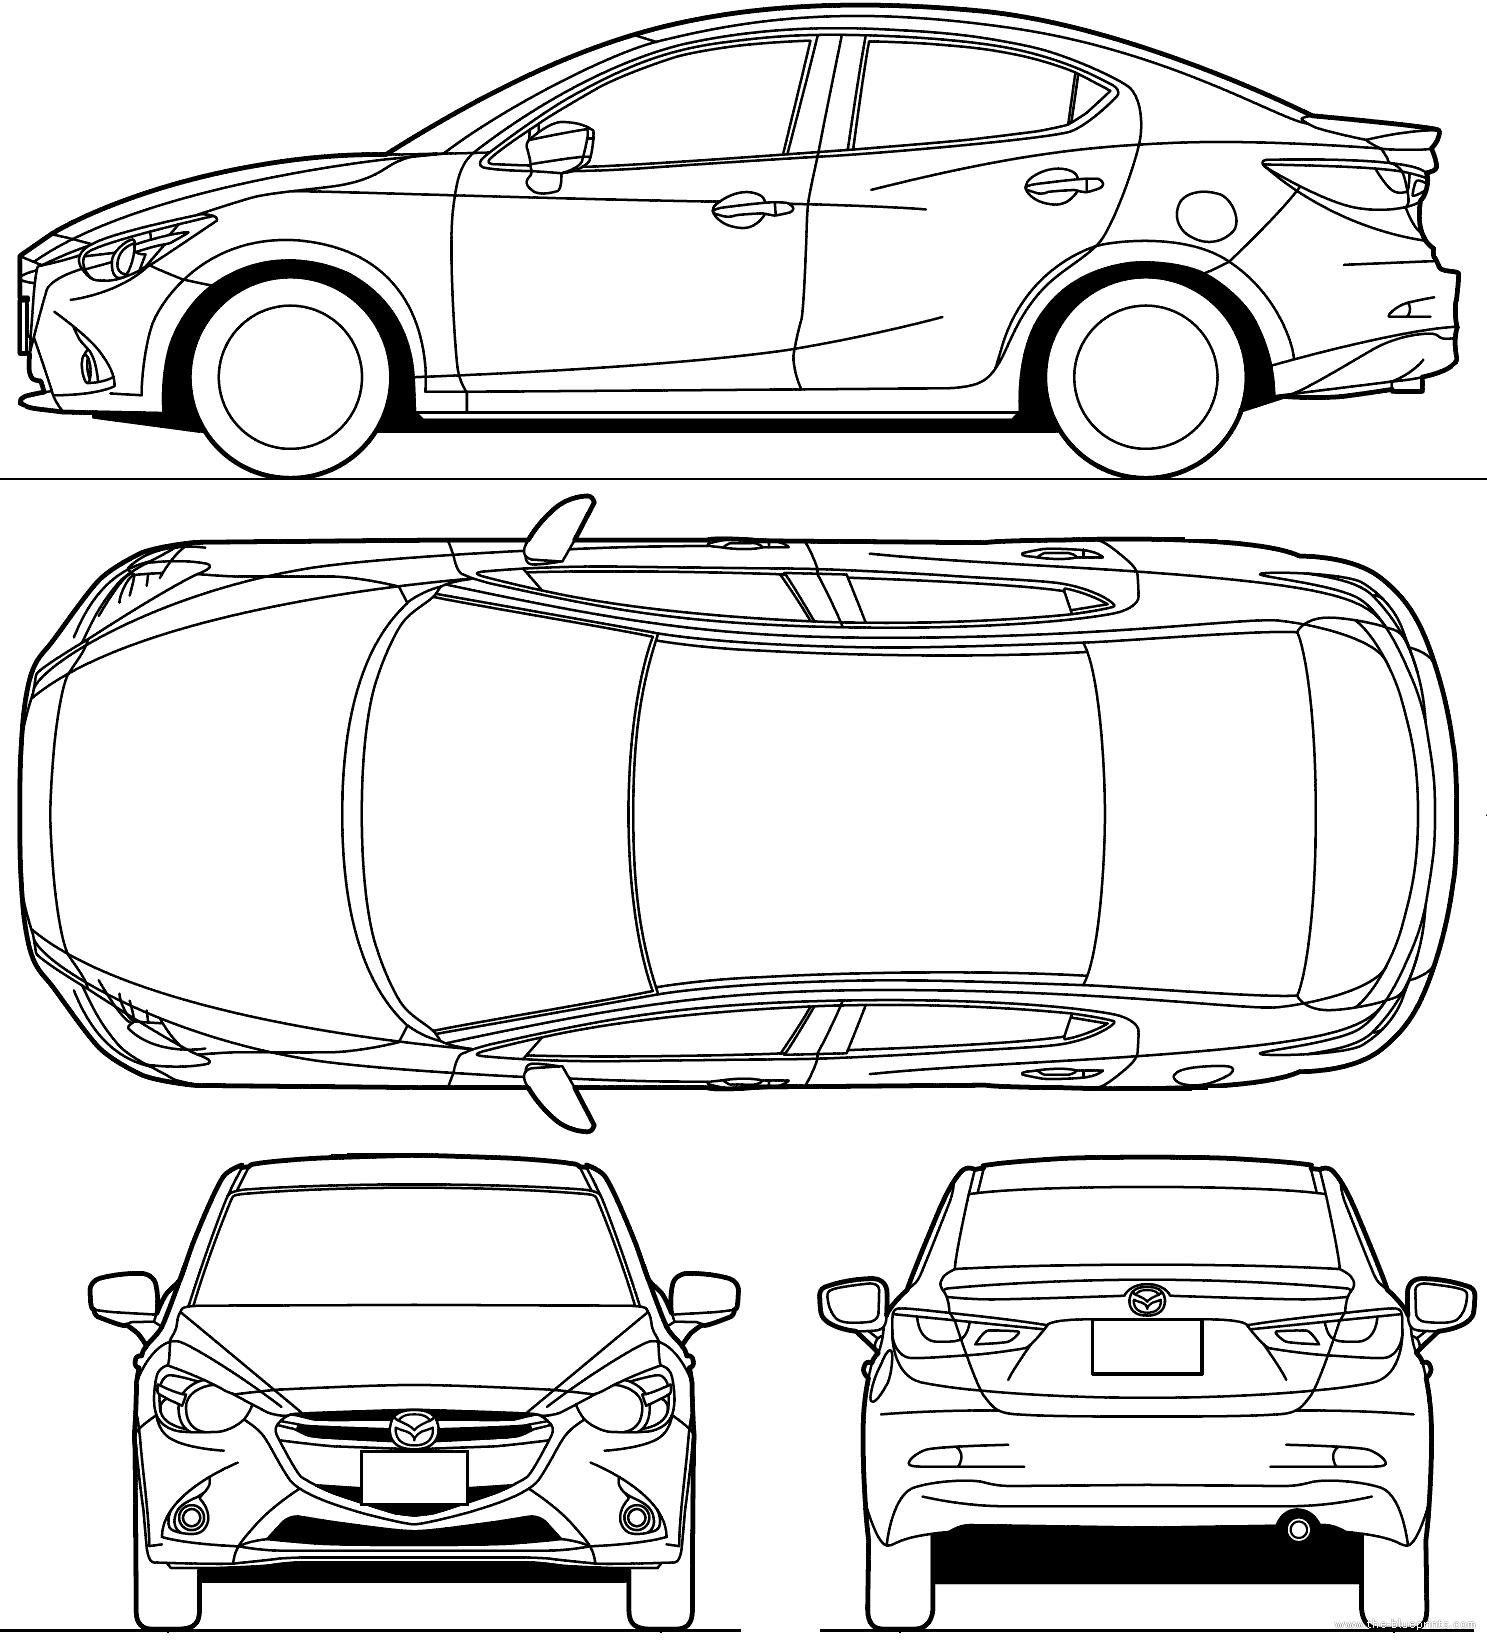 Blueprints cars mazda mazda 2 demio 2015 mazda 2 demio 2015 malvernweather Gallery